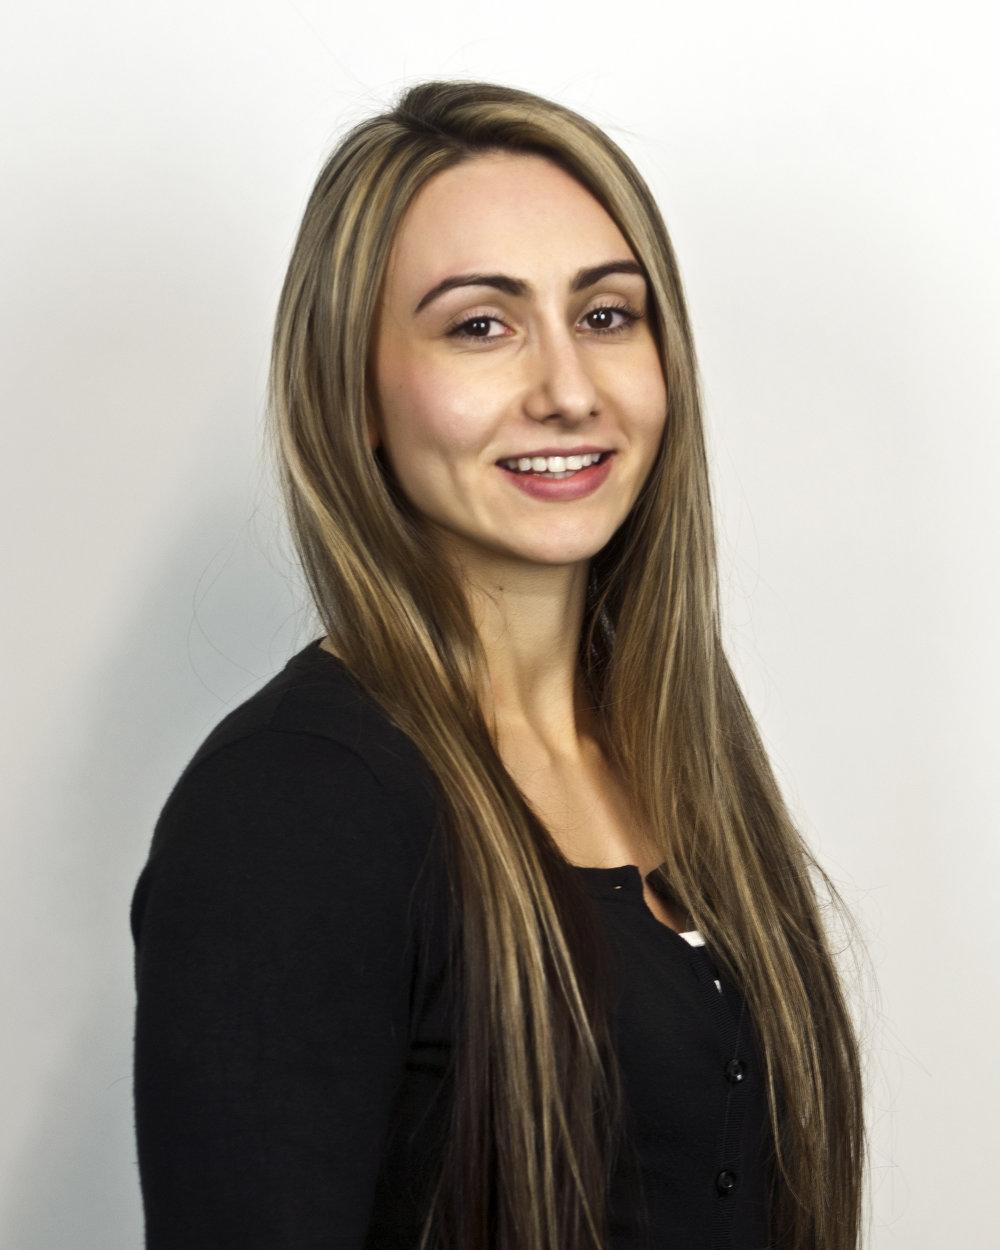 Annie Alegria |Board Member |Secretary Talent Coordinator @ Tech Talent Link